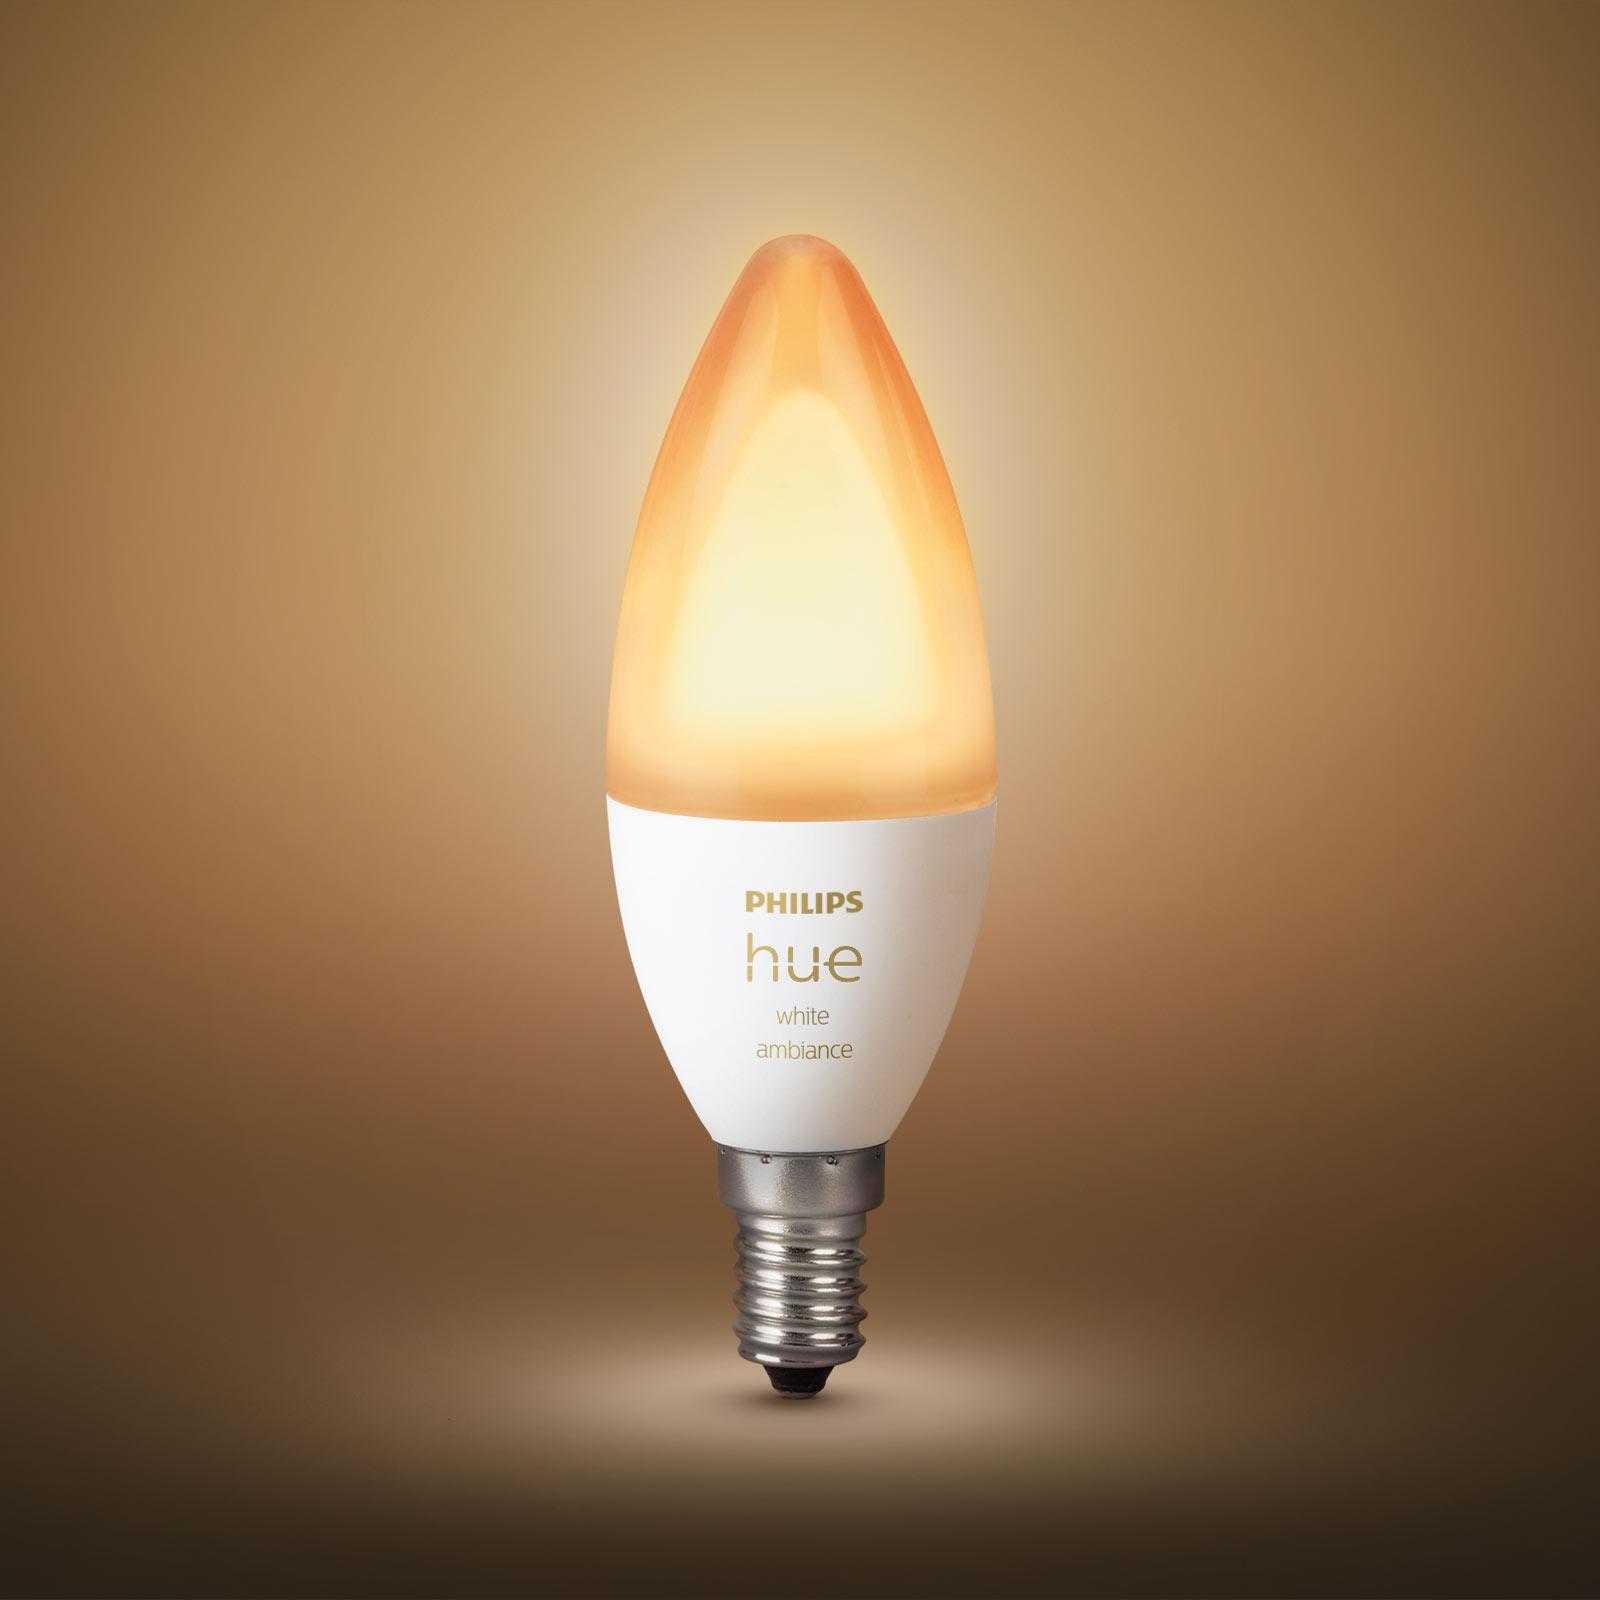 Philips Hue Kerzenlampe White Ambiance 2x E14 5,2W